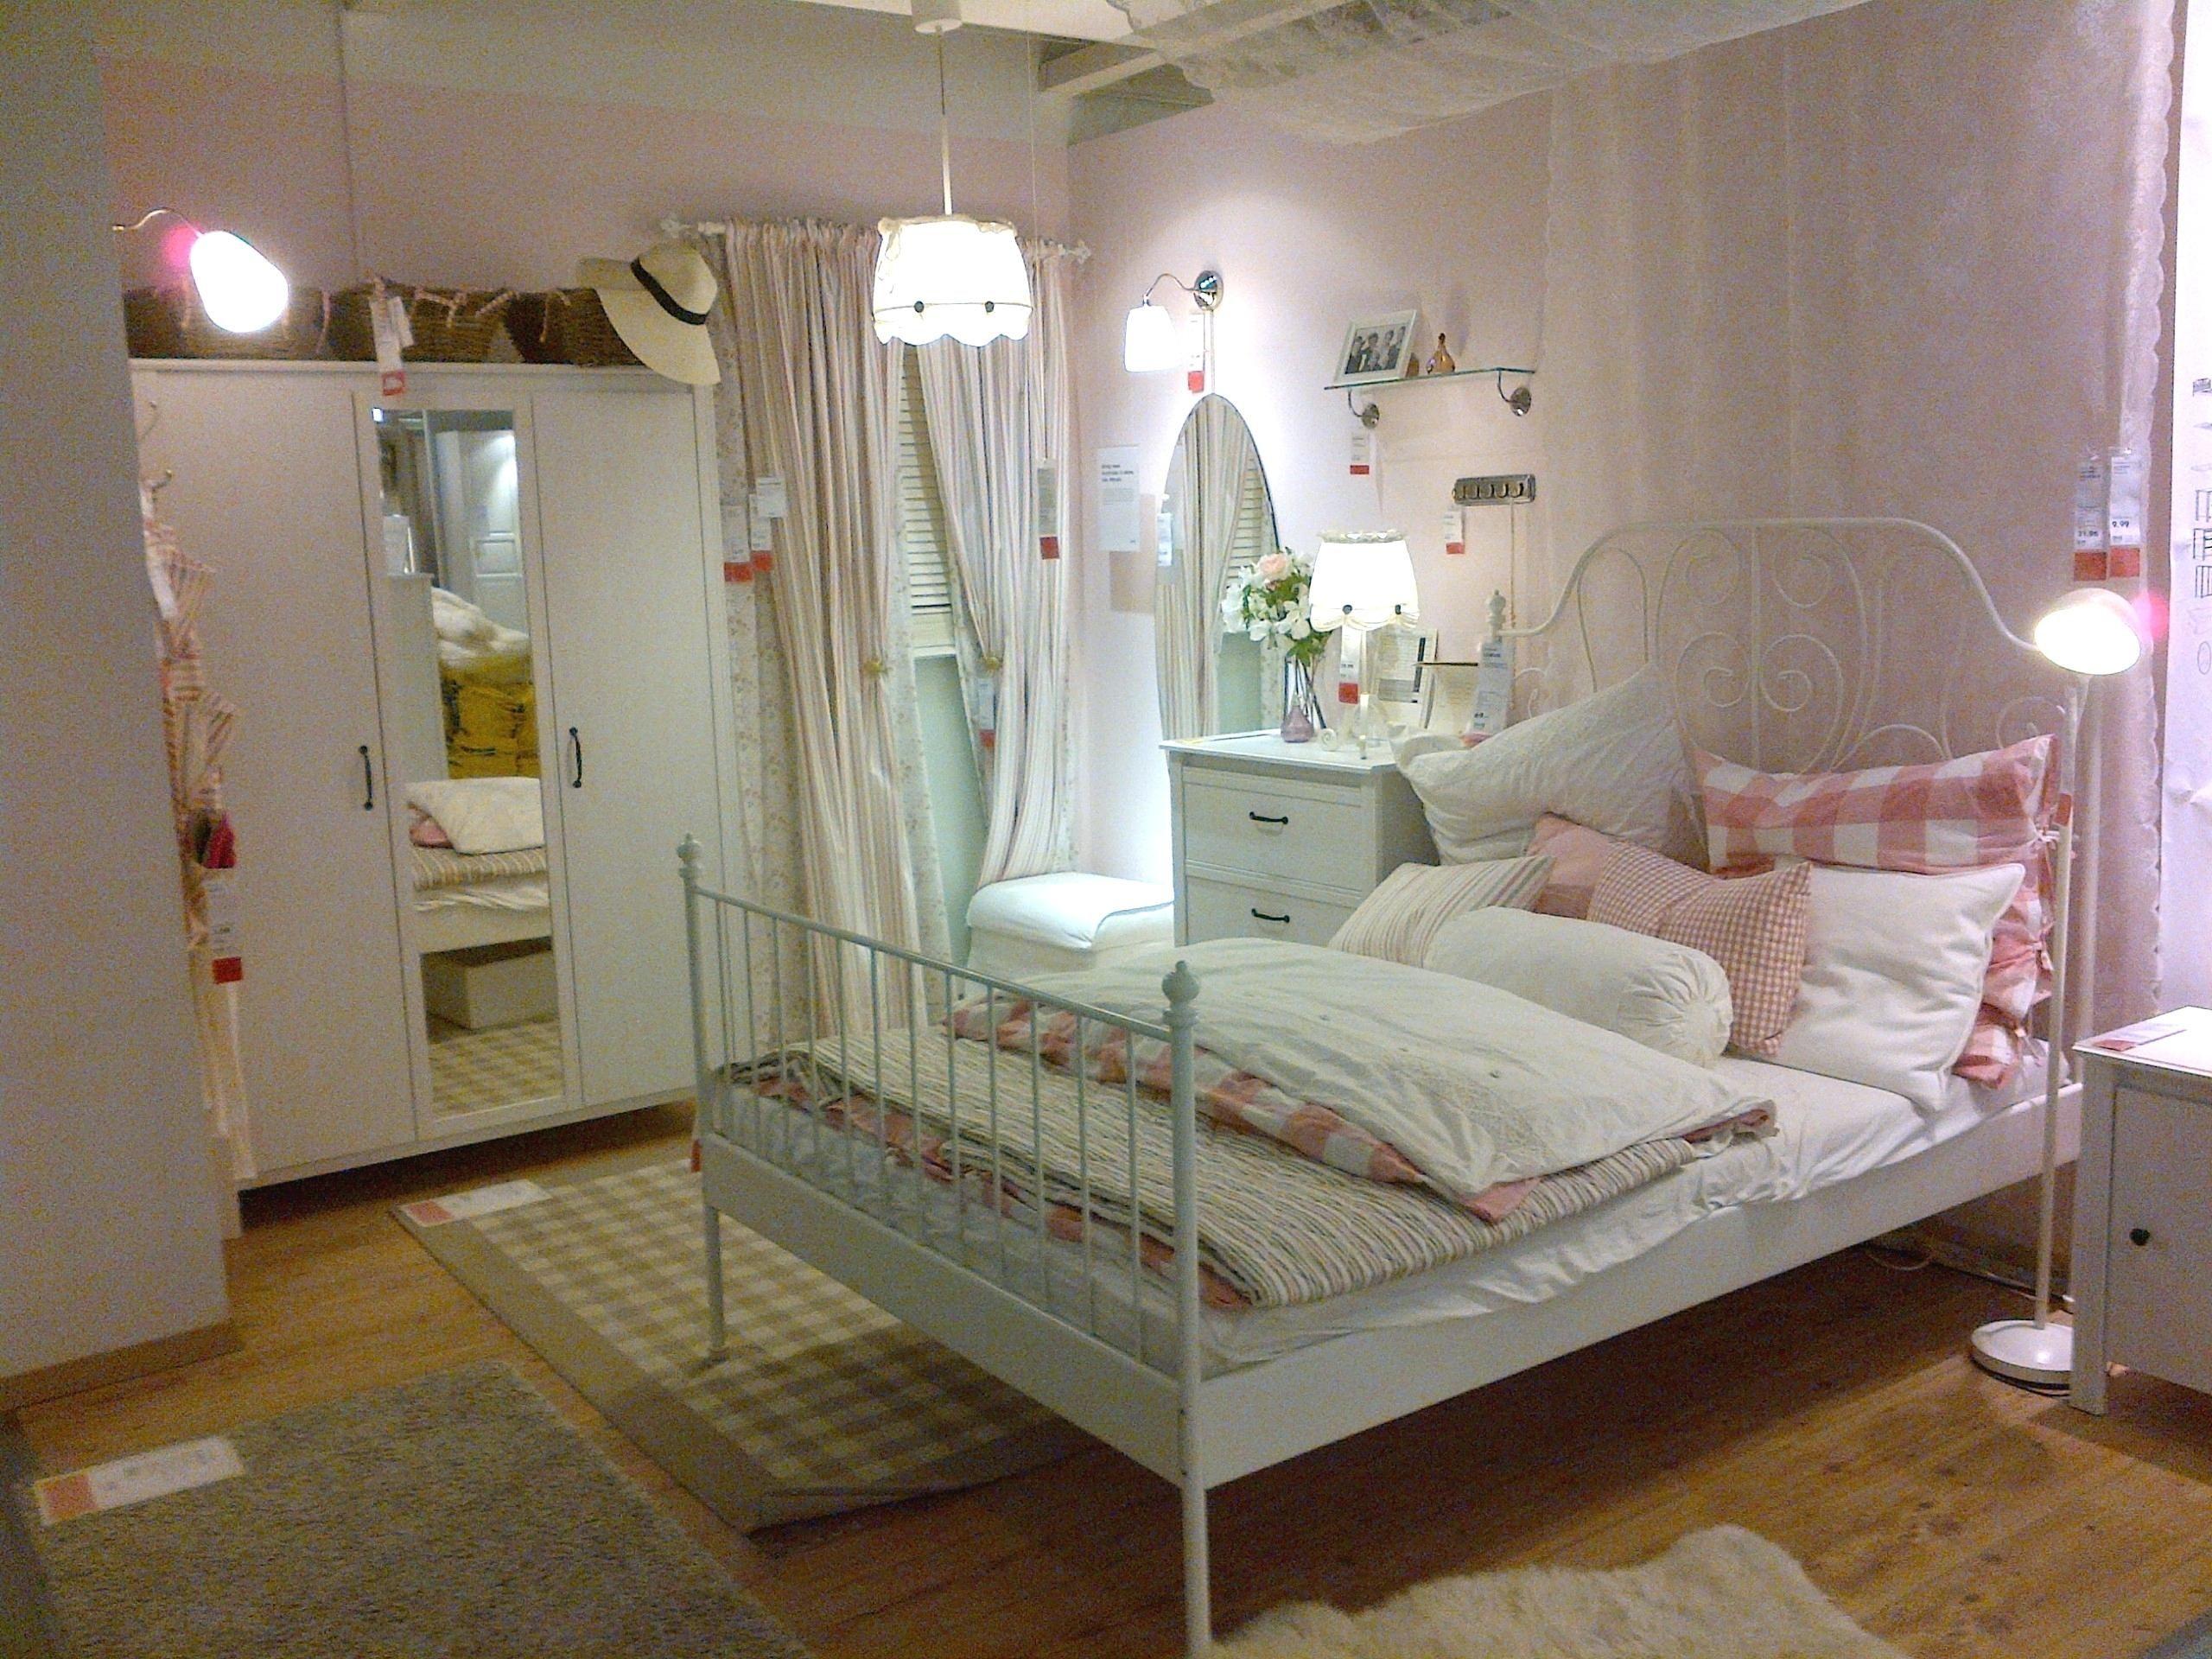 24 Genial Deko Ideen Schlafzimmer Ikea Deko Ideen Schlafzimmer